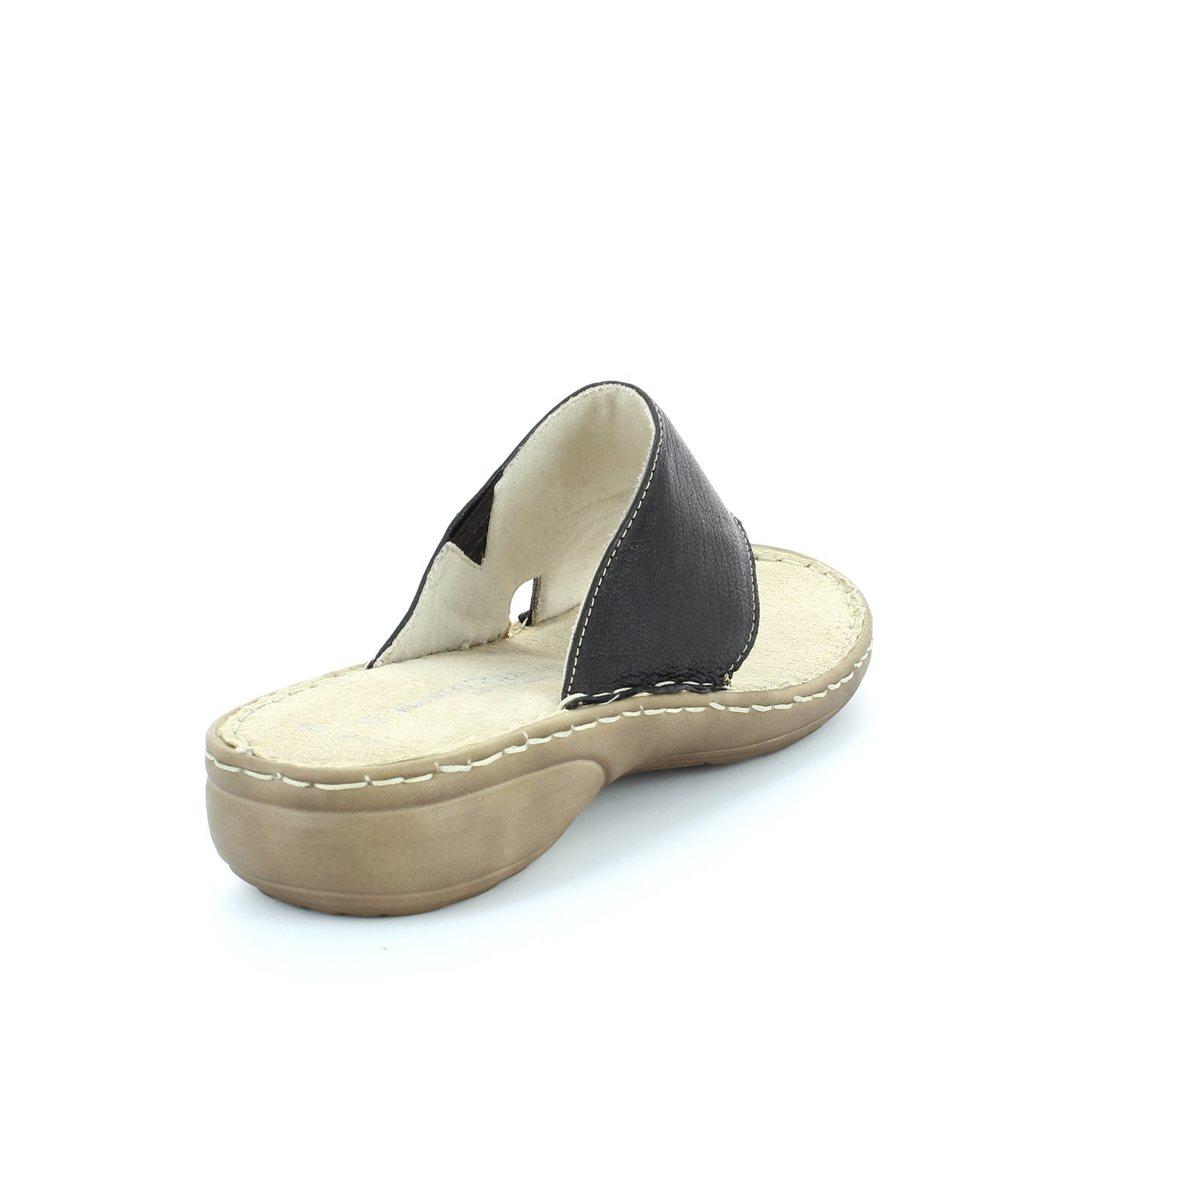 marco tozzi ocetto 27900 001 black sandals. Black Bedroom Furniture Sets. Home Design Ideas